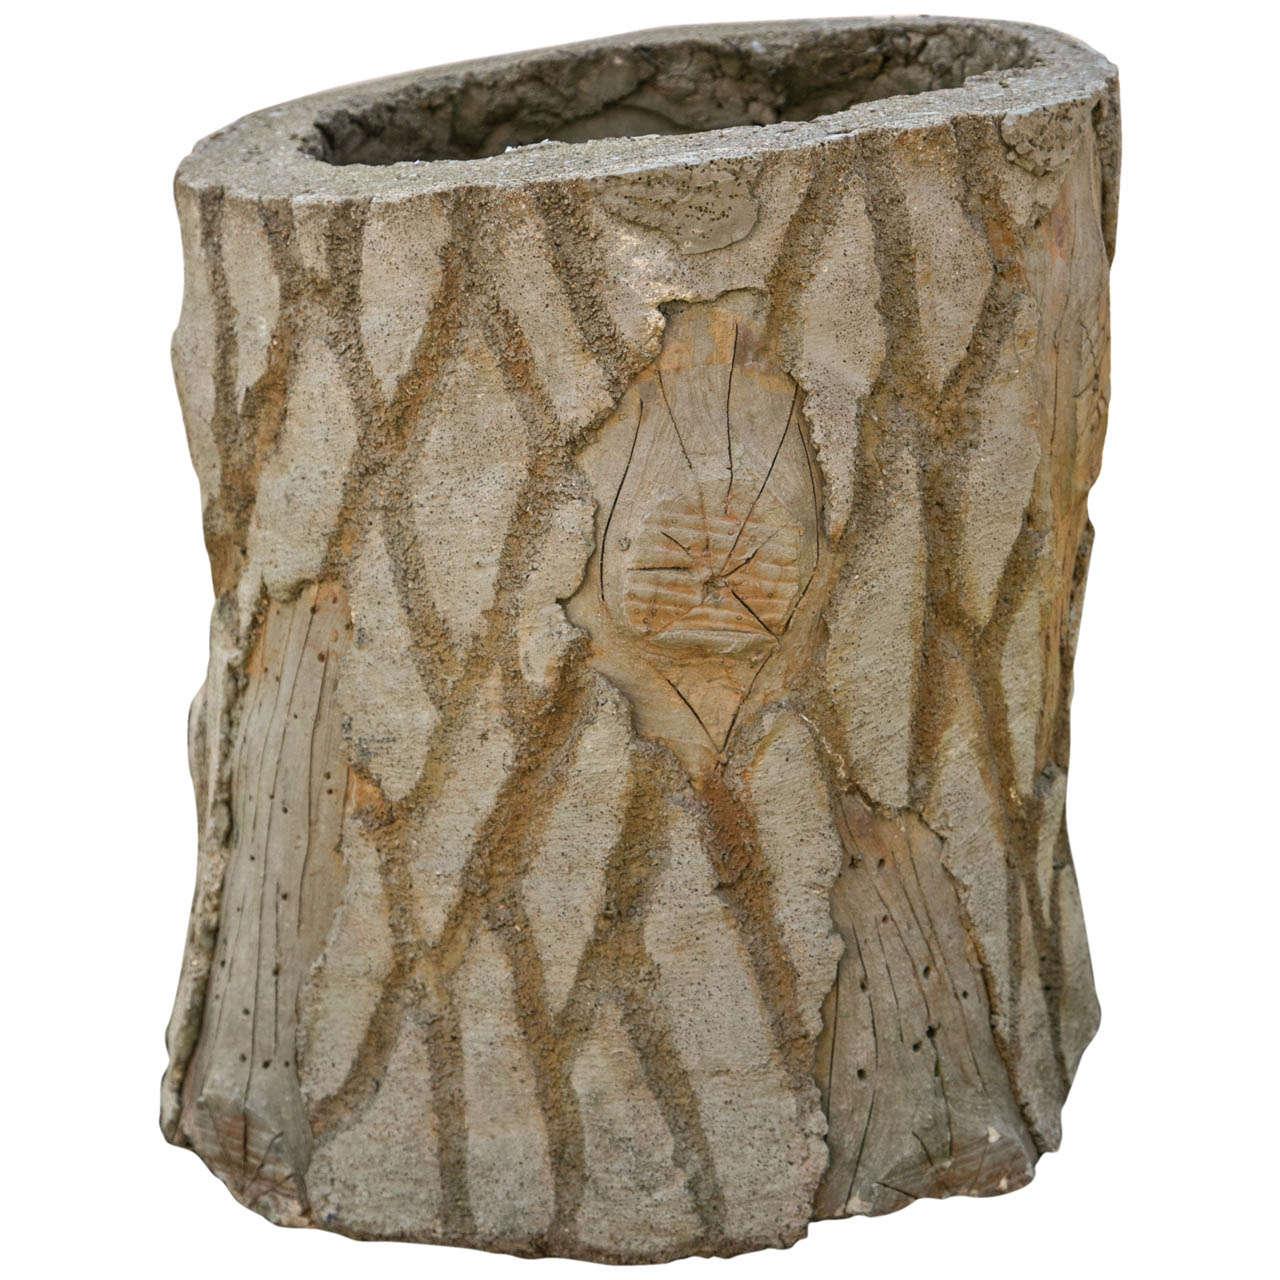 Faux Bois Tree Trunk Planter